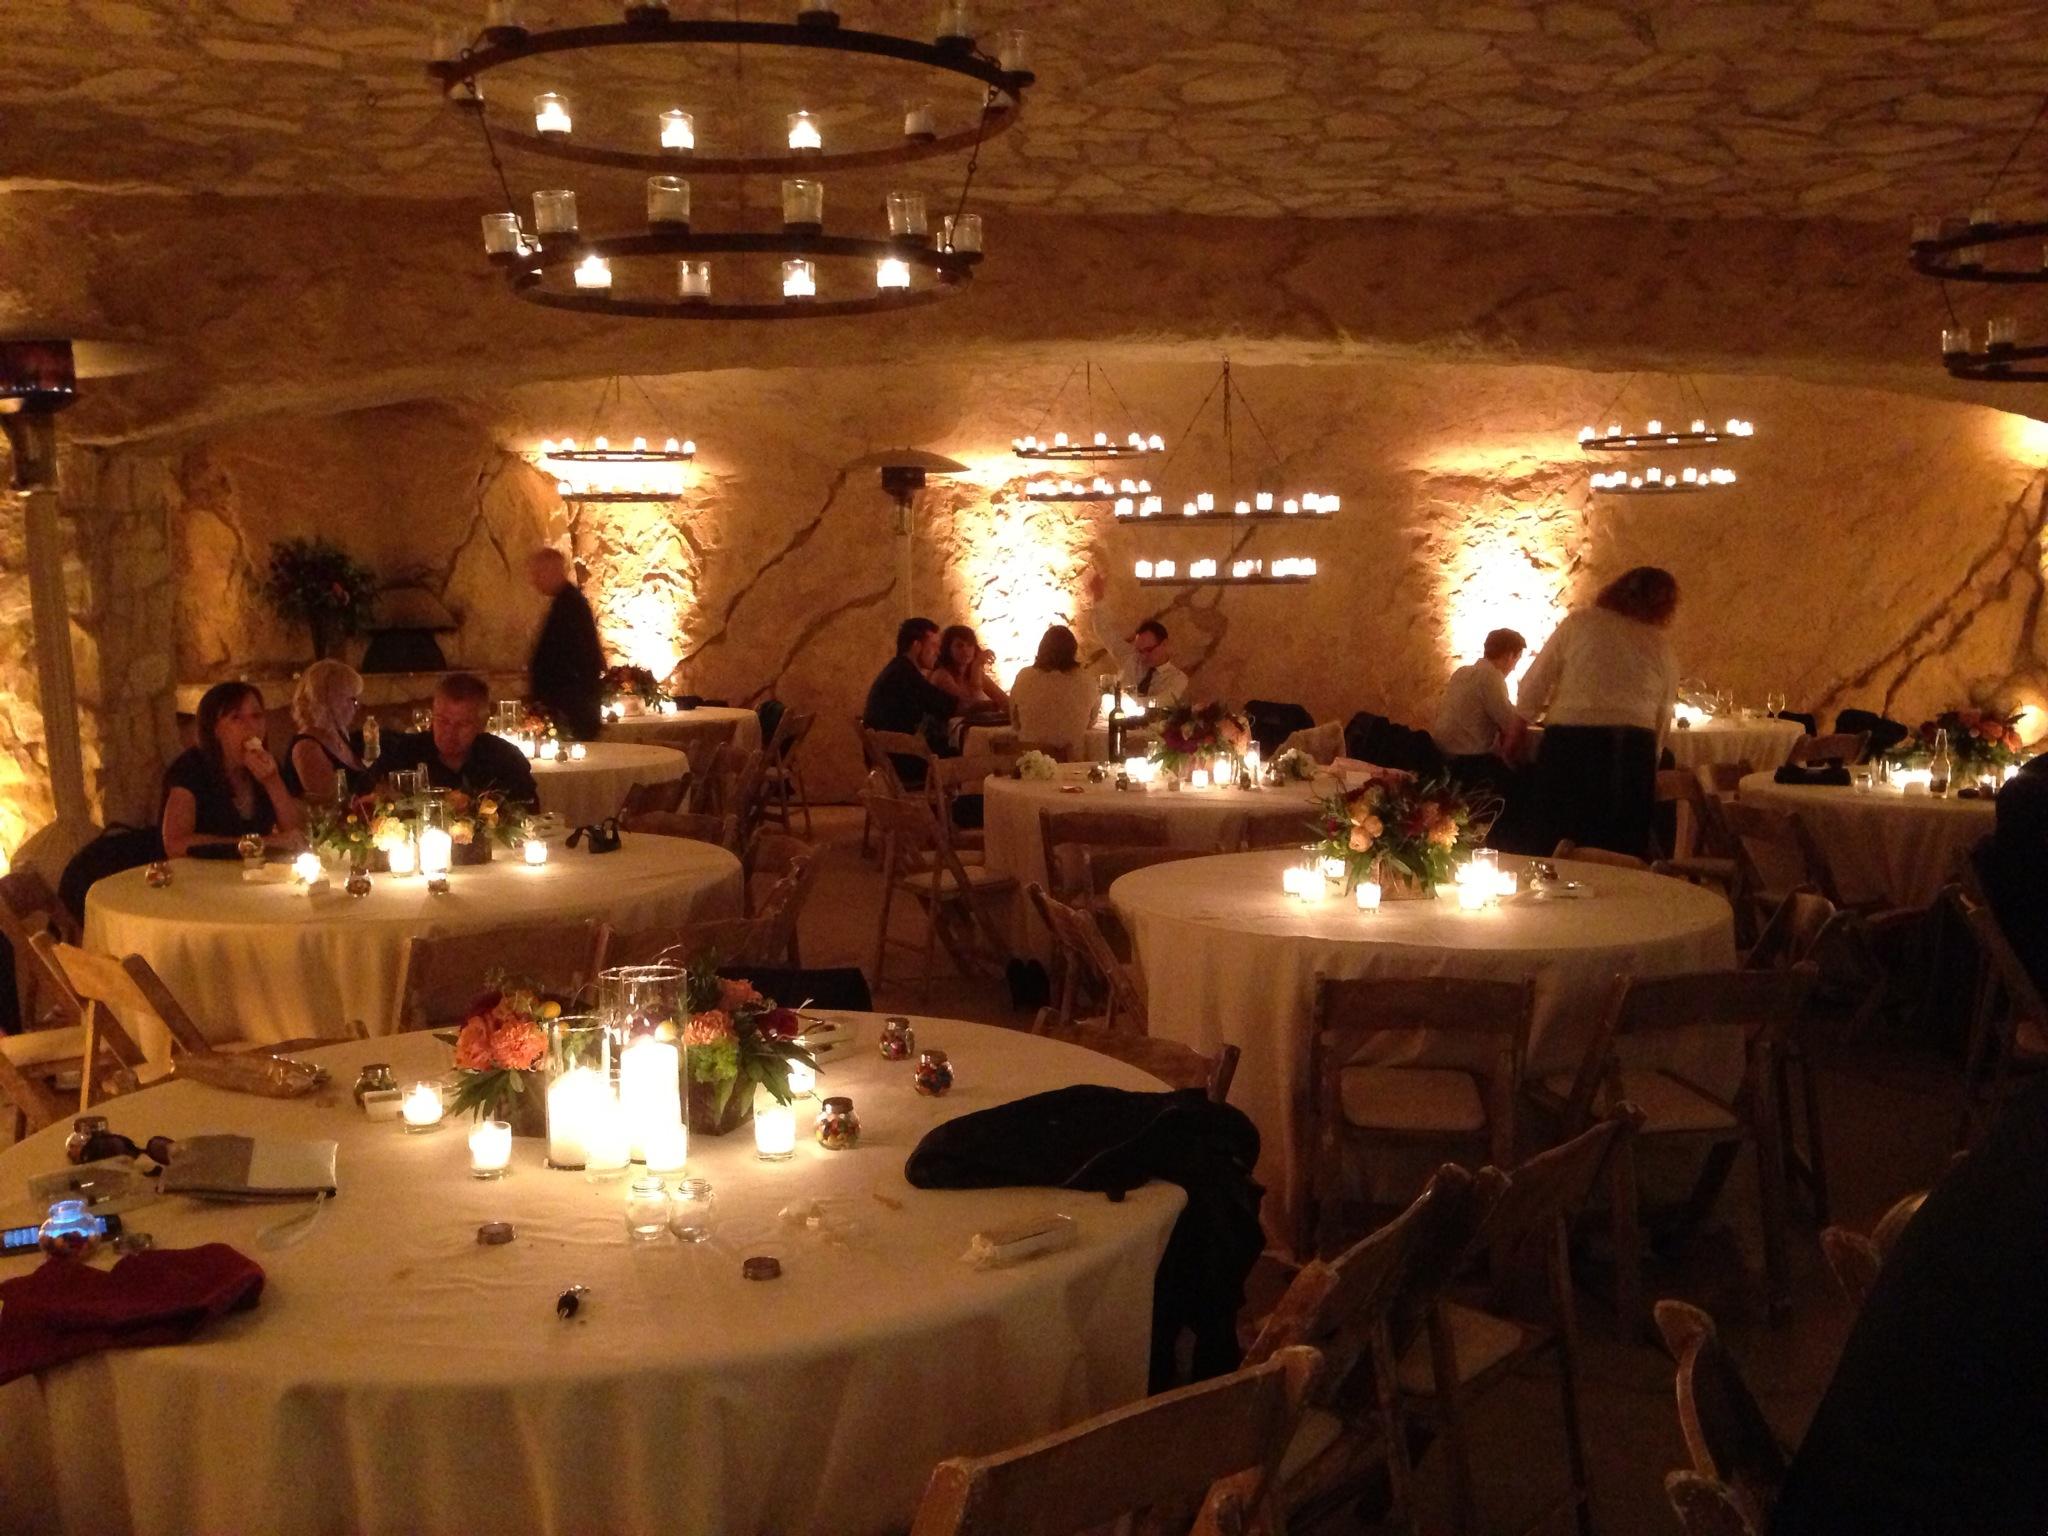 Santa Barbara Wedding DJs Event Lighting : Full lighting design house, uplighting, professional lighting, party lights